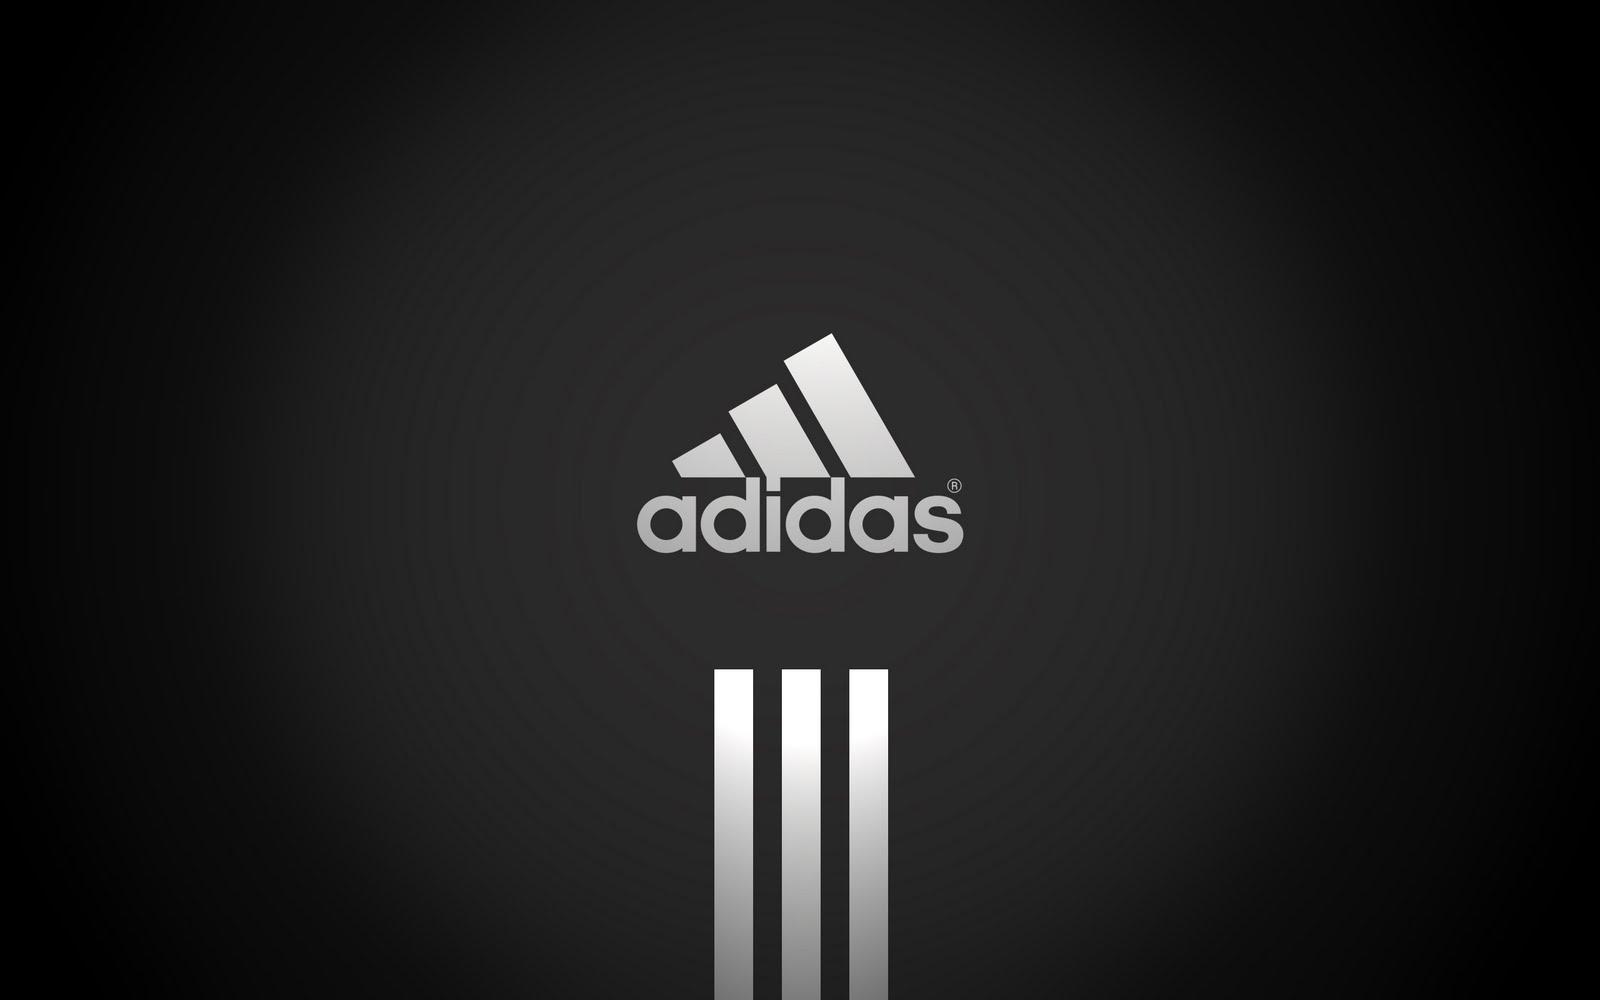 Adidas Geni Ekran Logo HD Wallpapers Kaliteli Resim 1600x1000